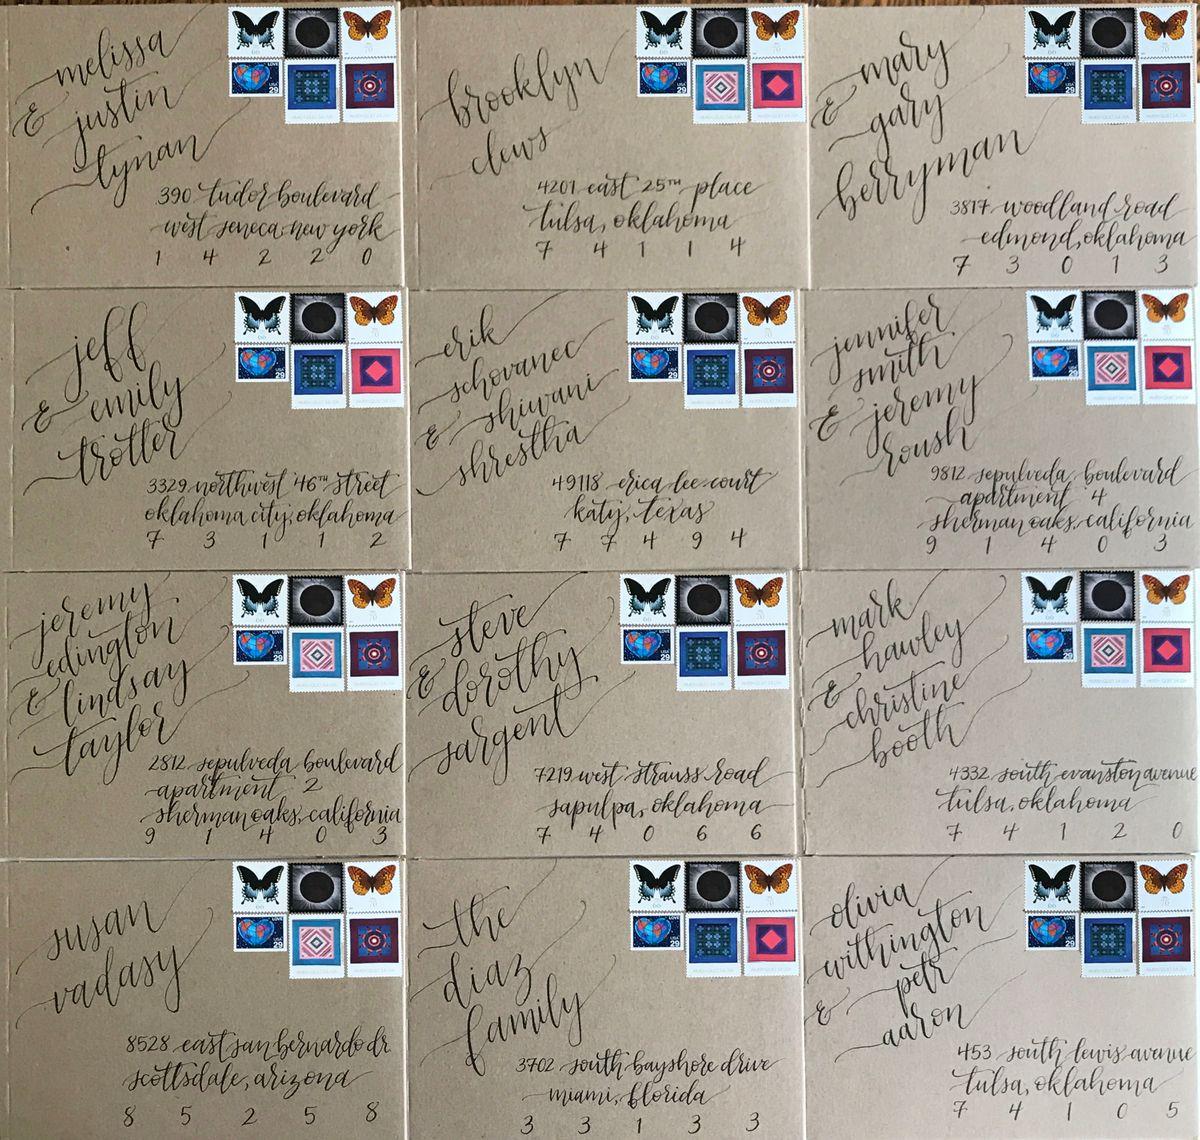 Kraft Envelopes with Stamps - Changed Addresses.jpg